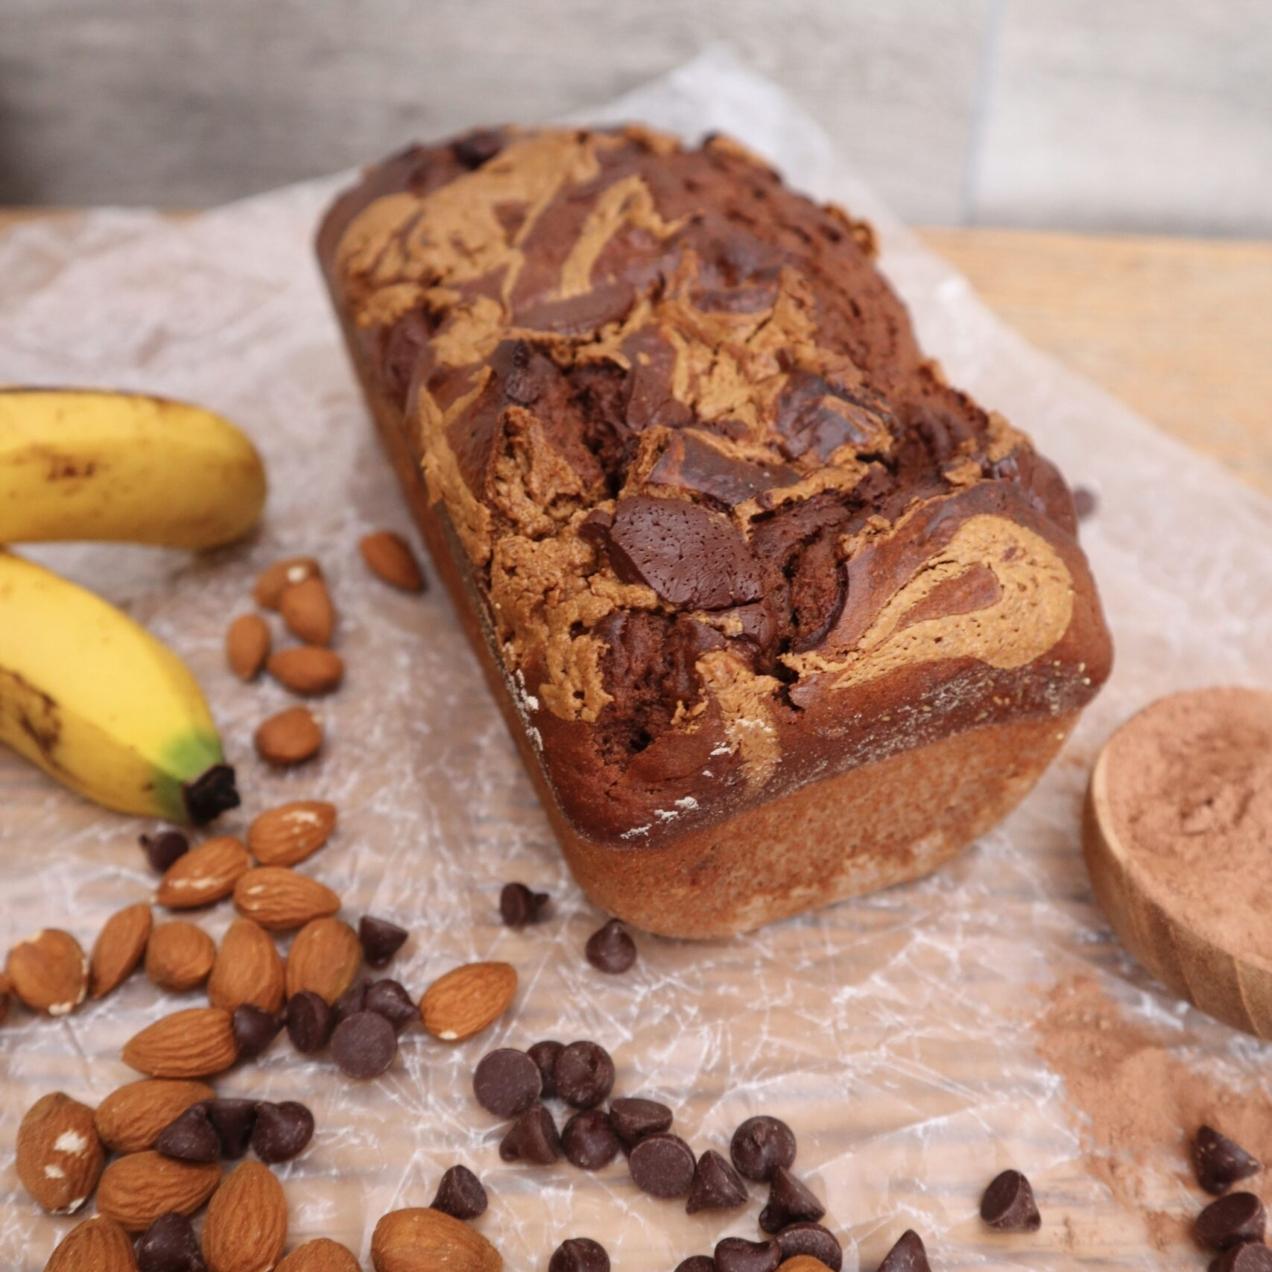 Banana Bread de Chocolate con Crema de Almendras.